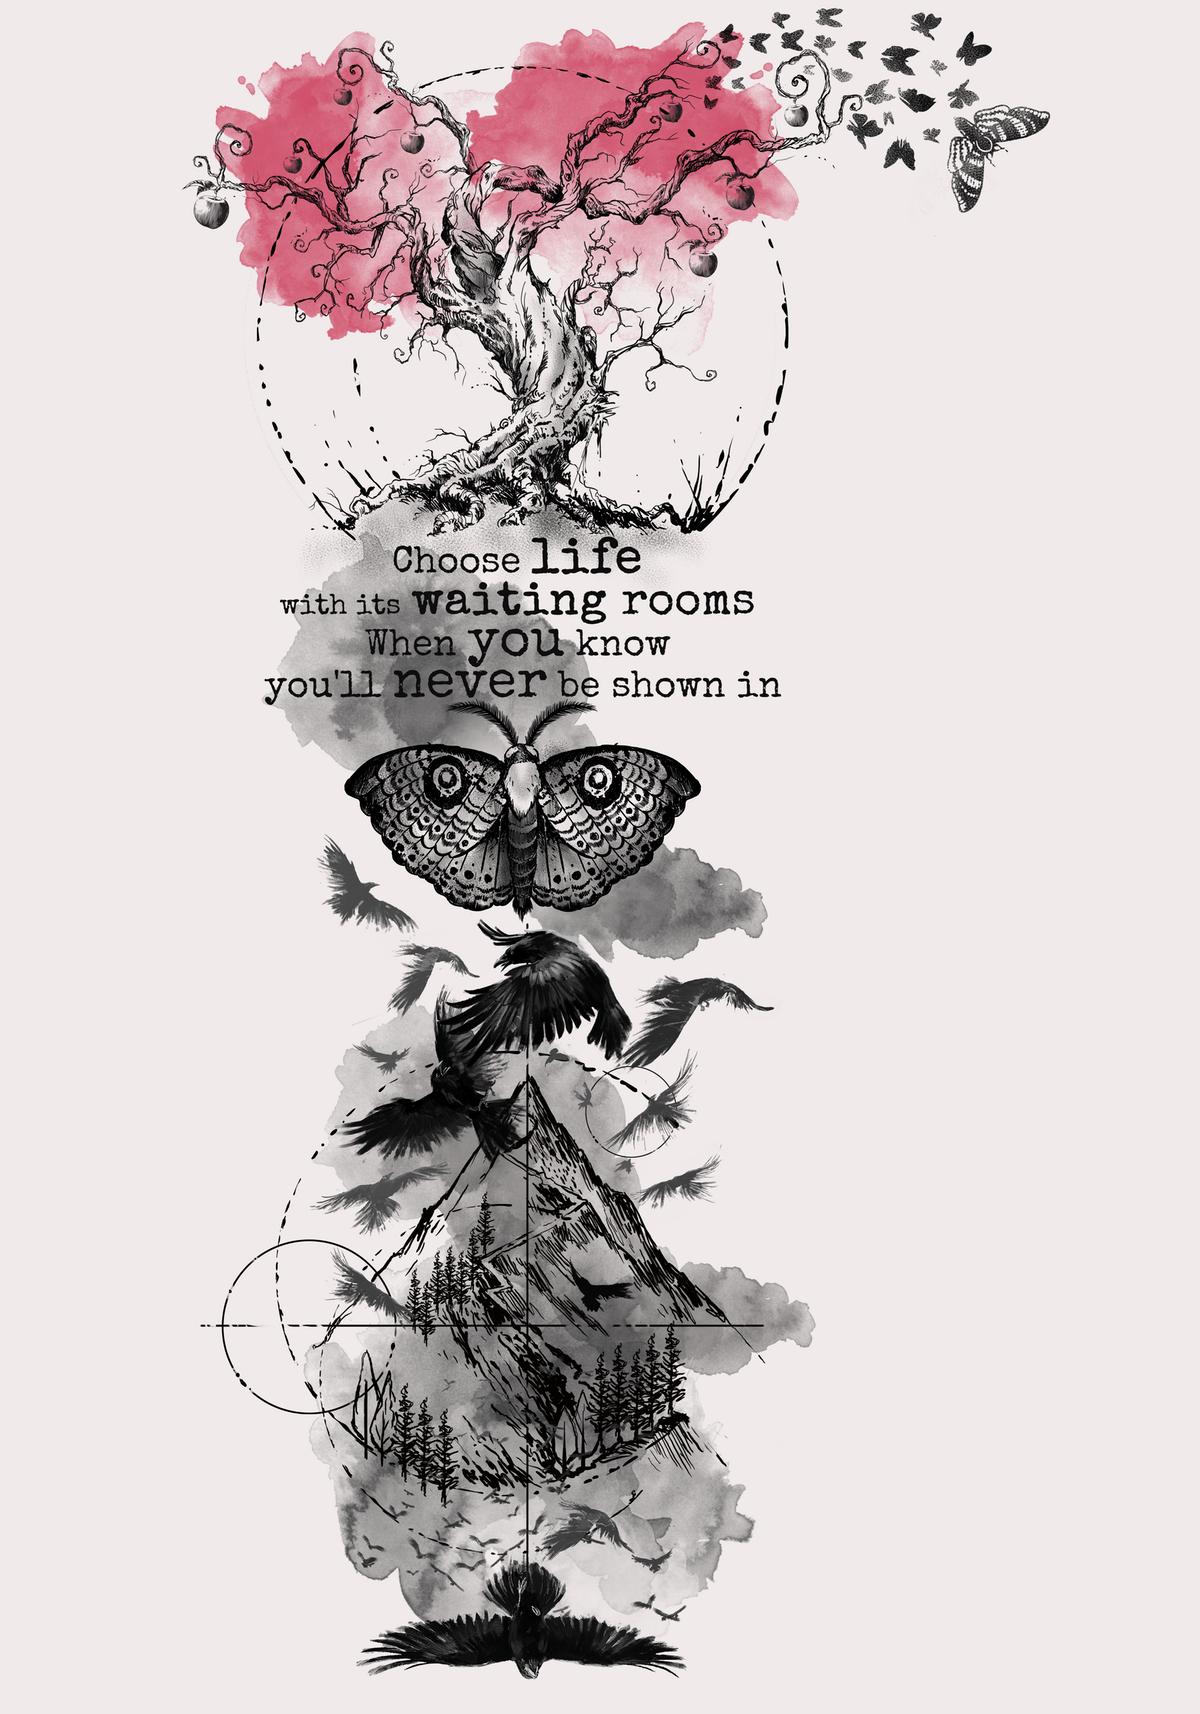 Luke's Tattoo of Poems